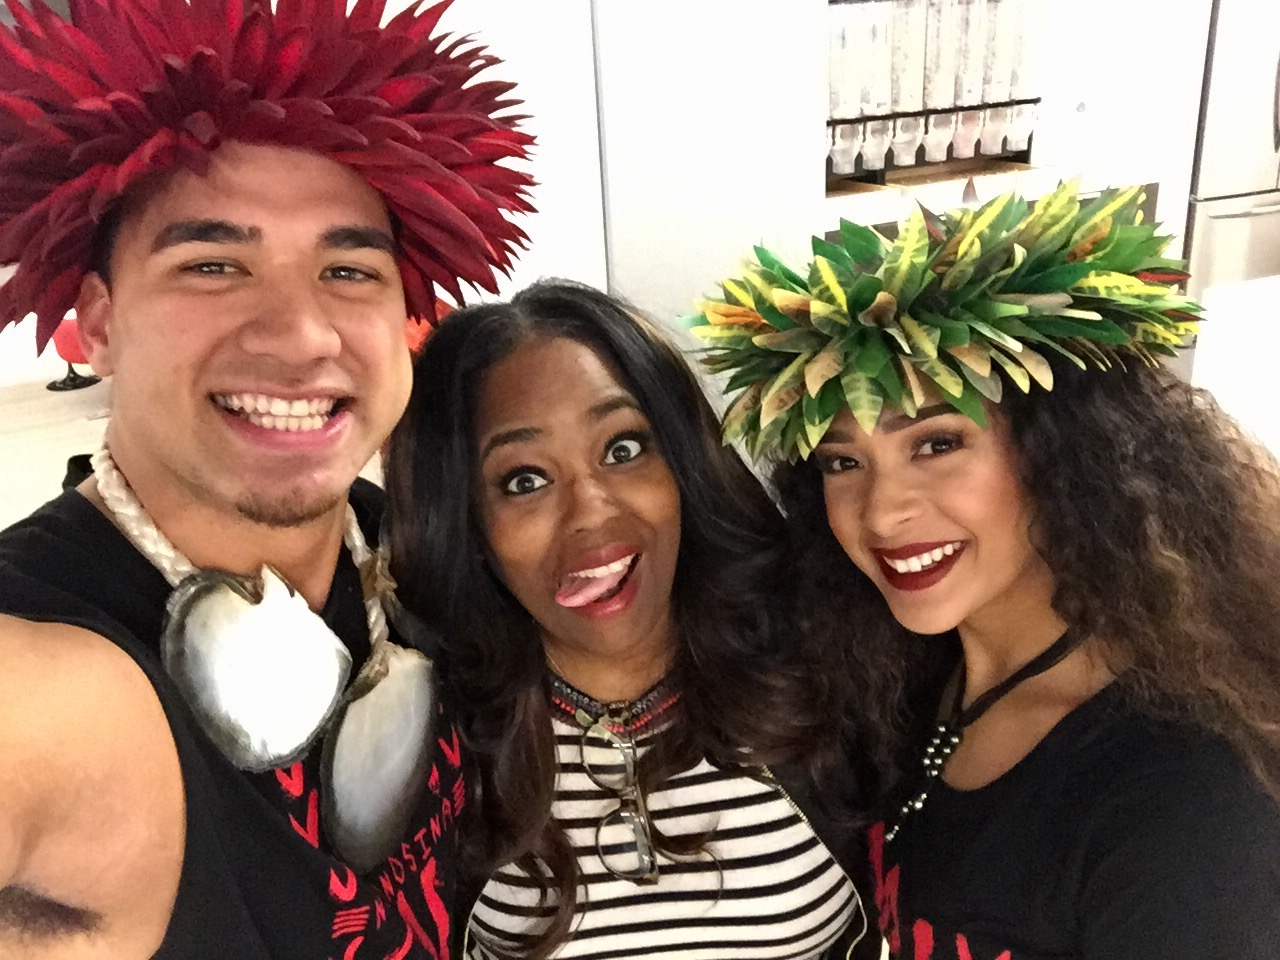 Moana Presentation & Polynesian-Themed Dinner Party At Walt Disney Studios